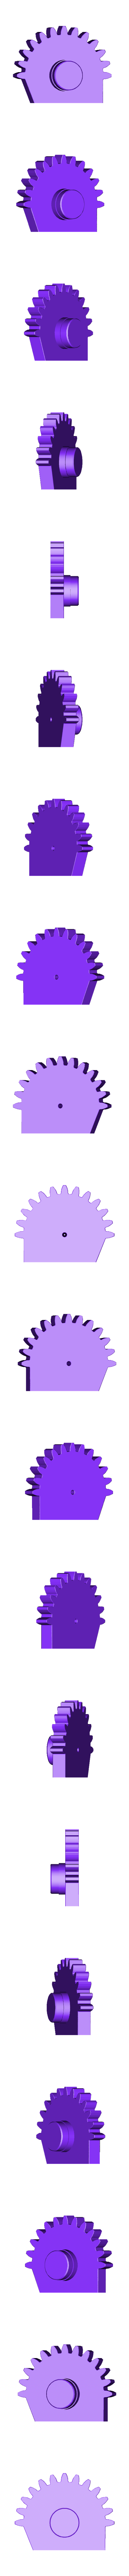 gear_leg_L.stl Download free STL file RoboDog v1.0 • 3D printing object, robolab19